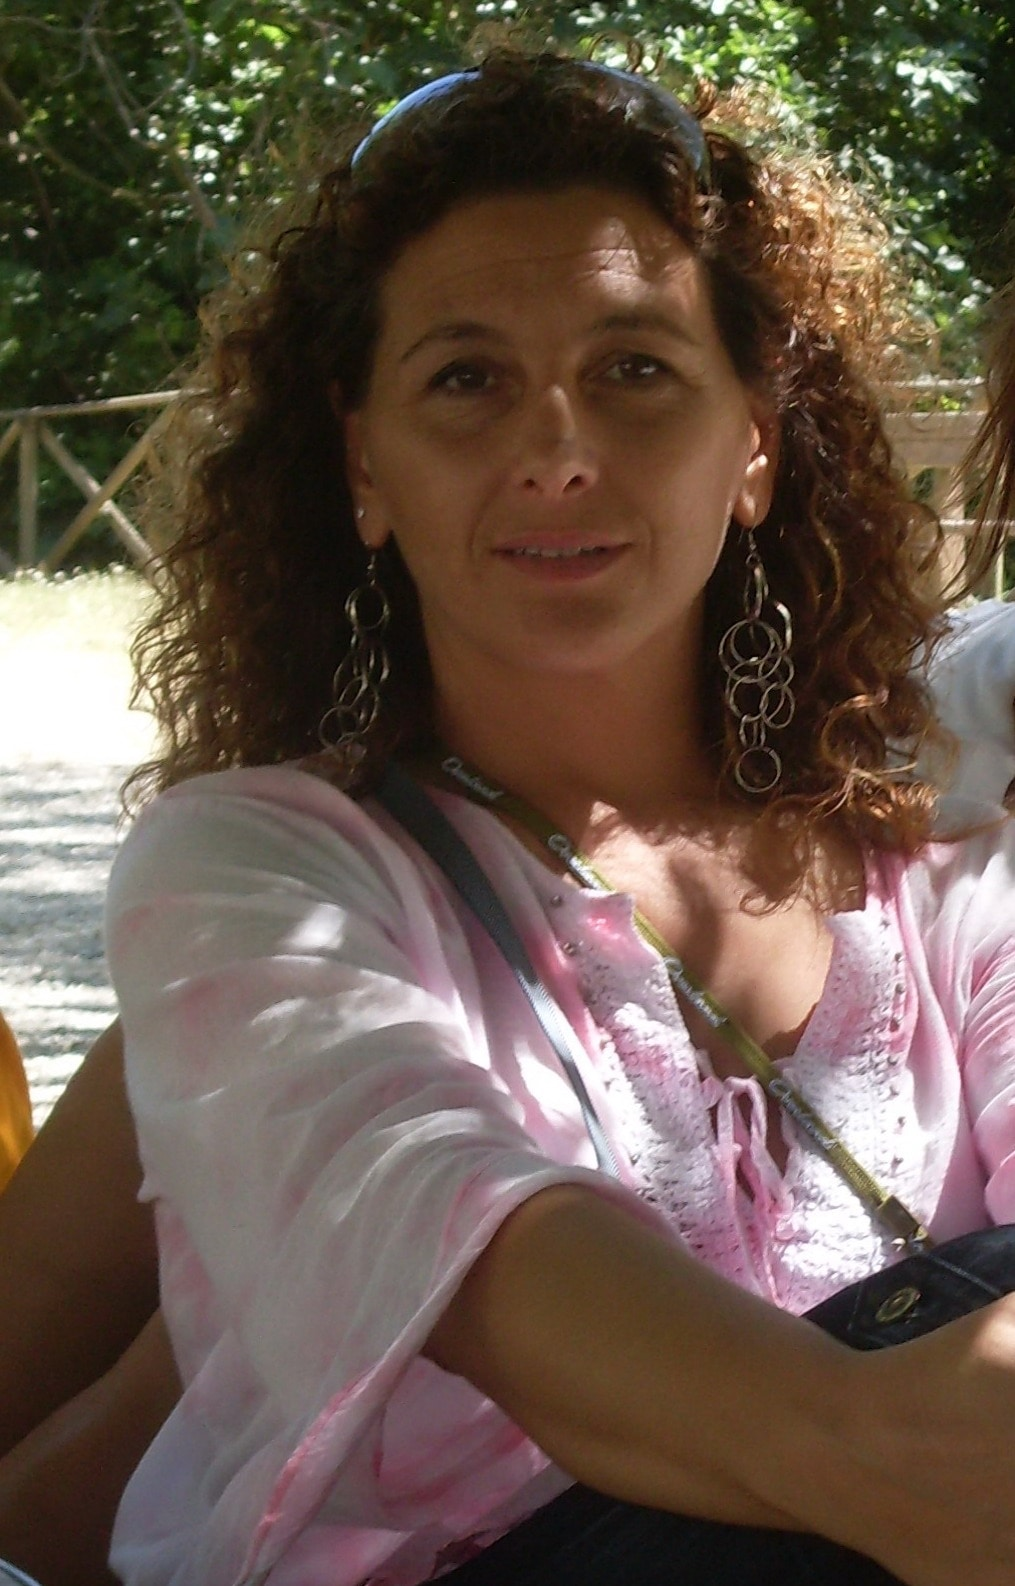 Ciao sono Francesca, gestisco questa casa vacanze